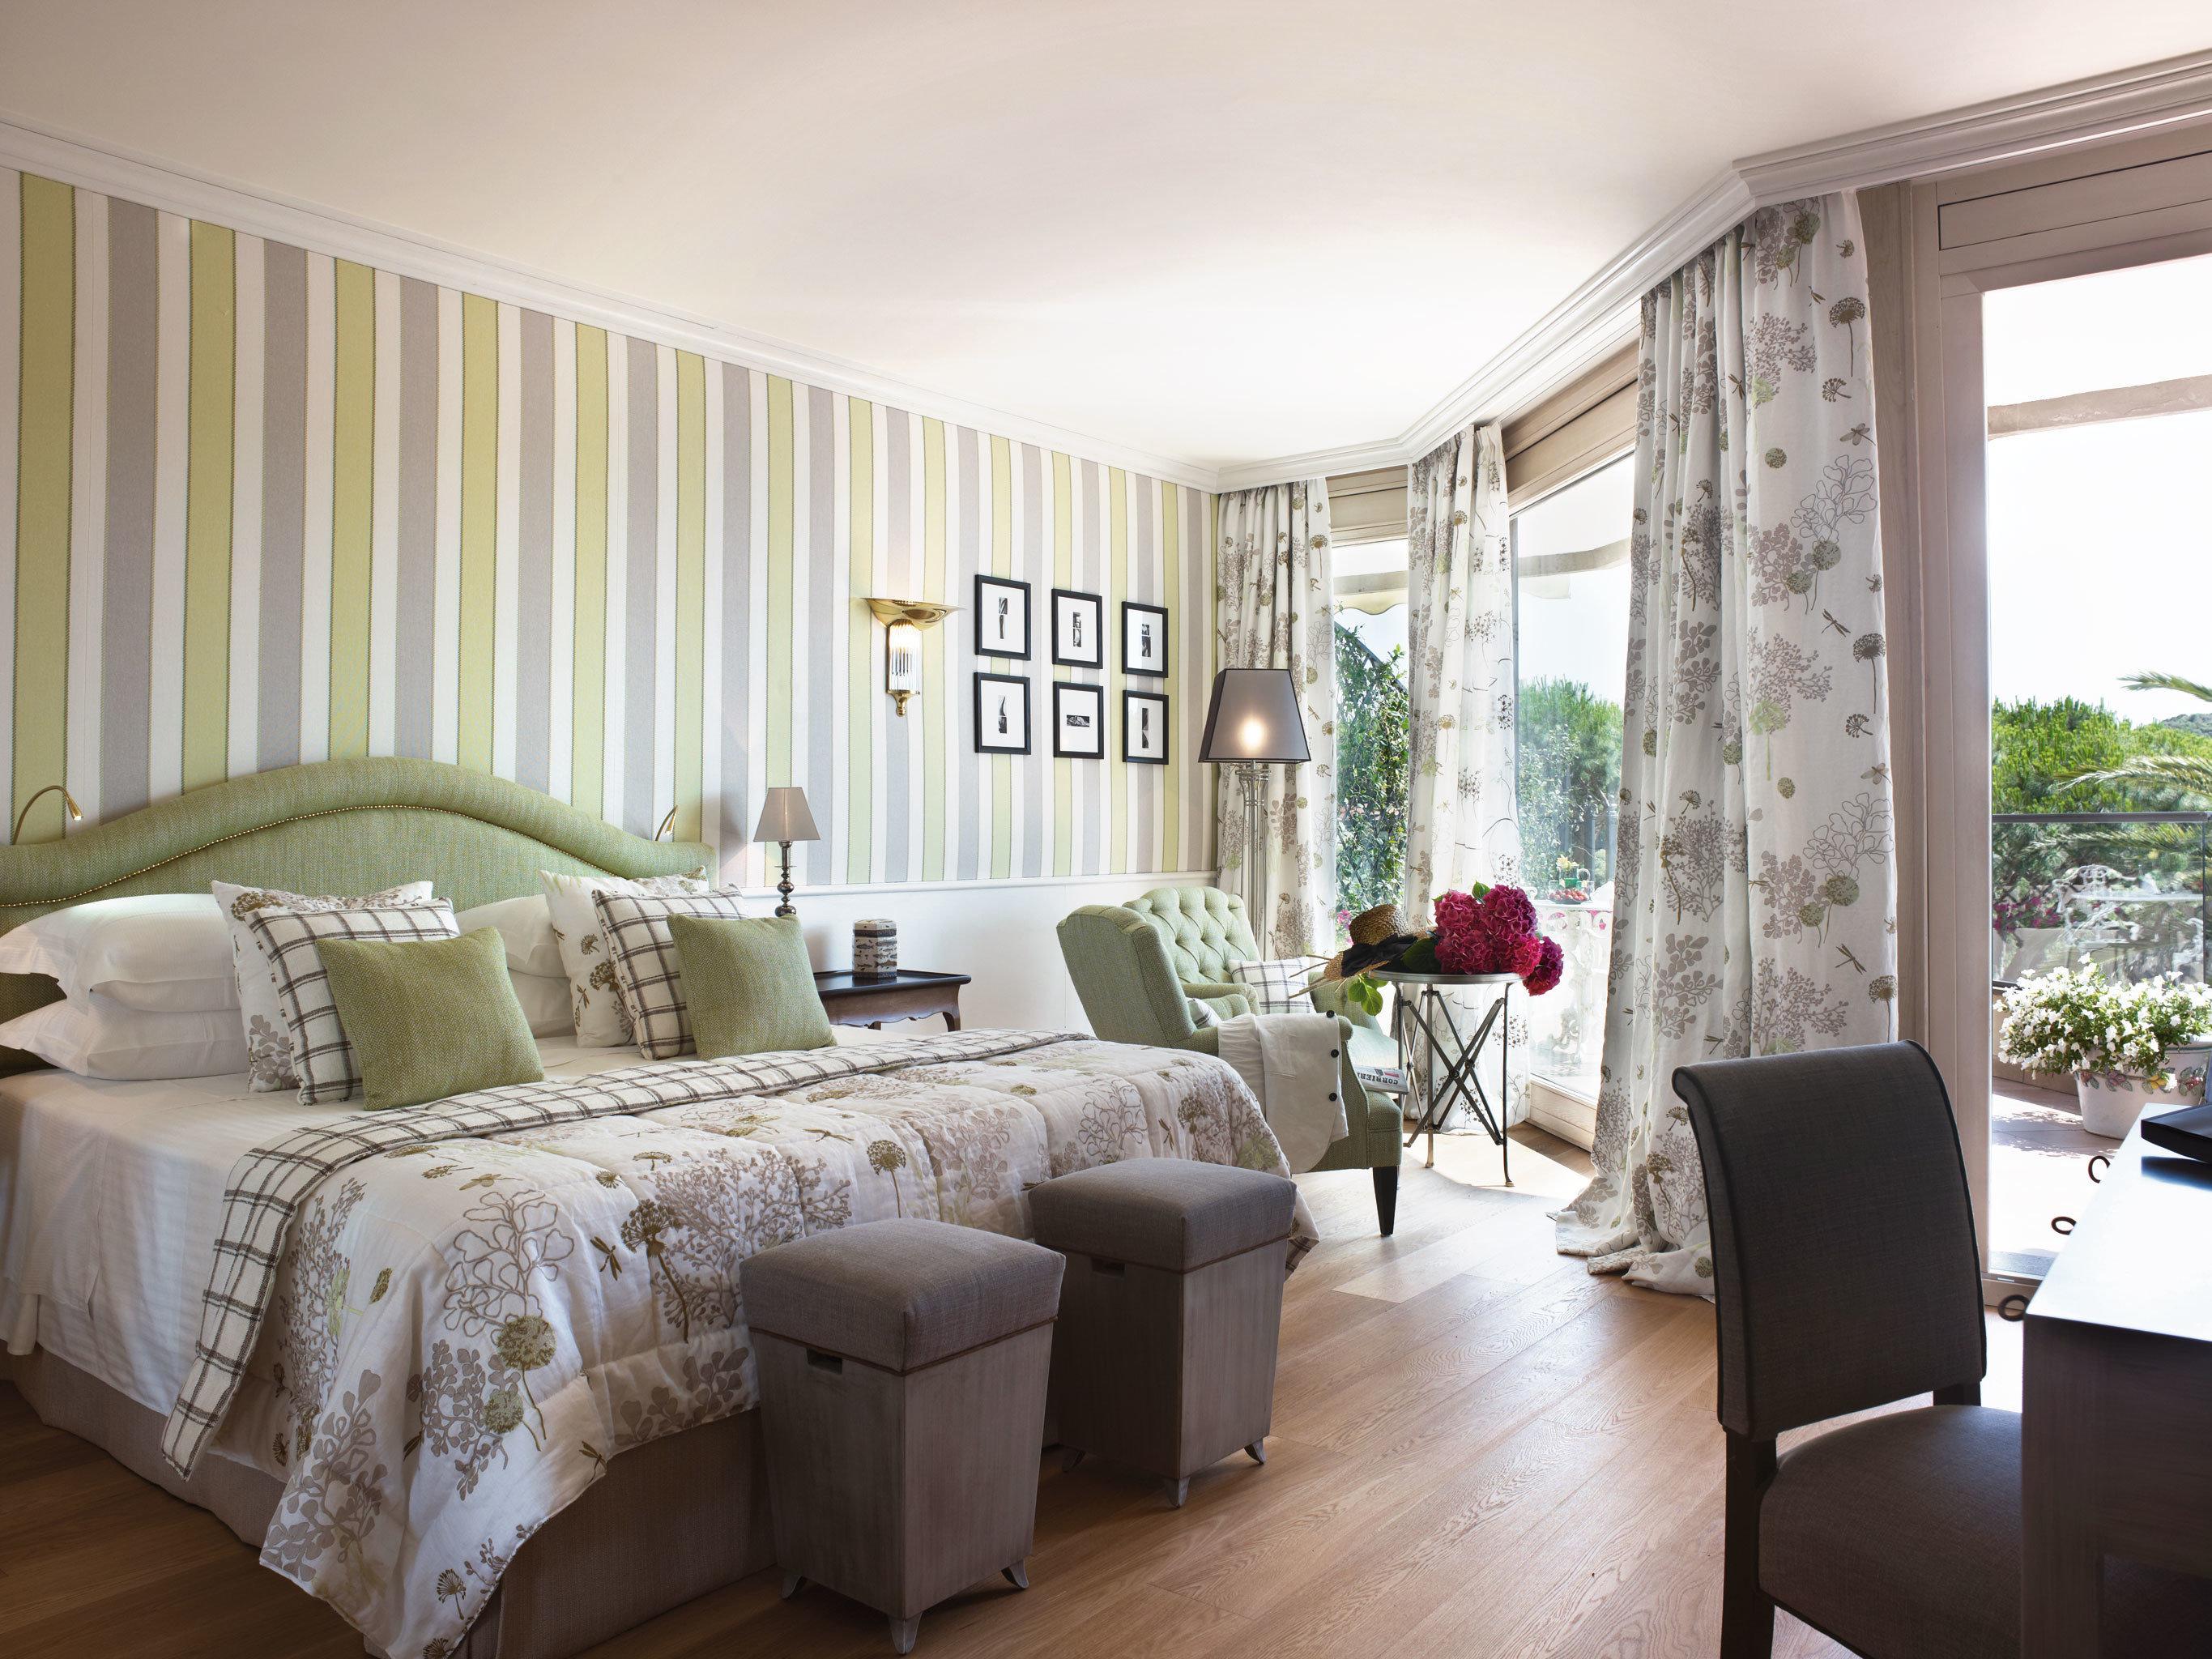 Bedroom Elegant Lounge Scenic views Waterfront sofa property living room home hardwood cottage Villa condominium farmhouse containing